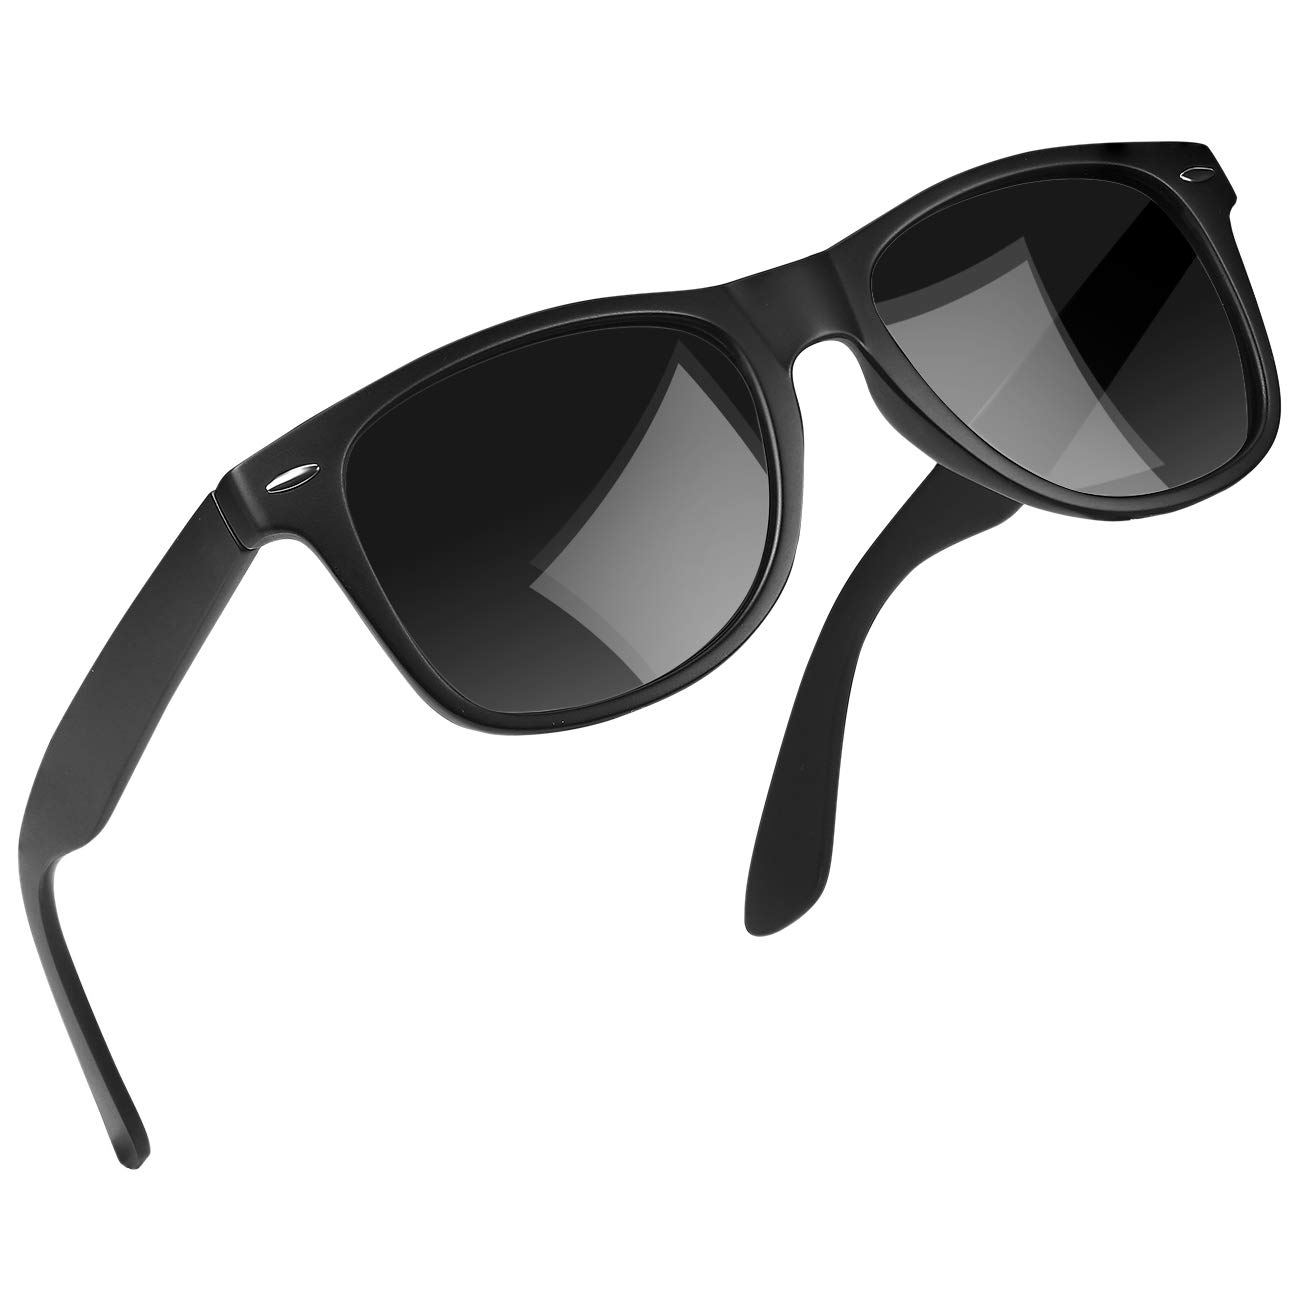 Joopin Polarized TR90 Unbreakable Sunglasses Classic Lightweight Sun glasses UV400 (TR90 Black)